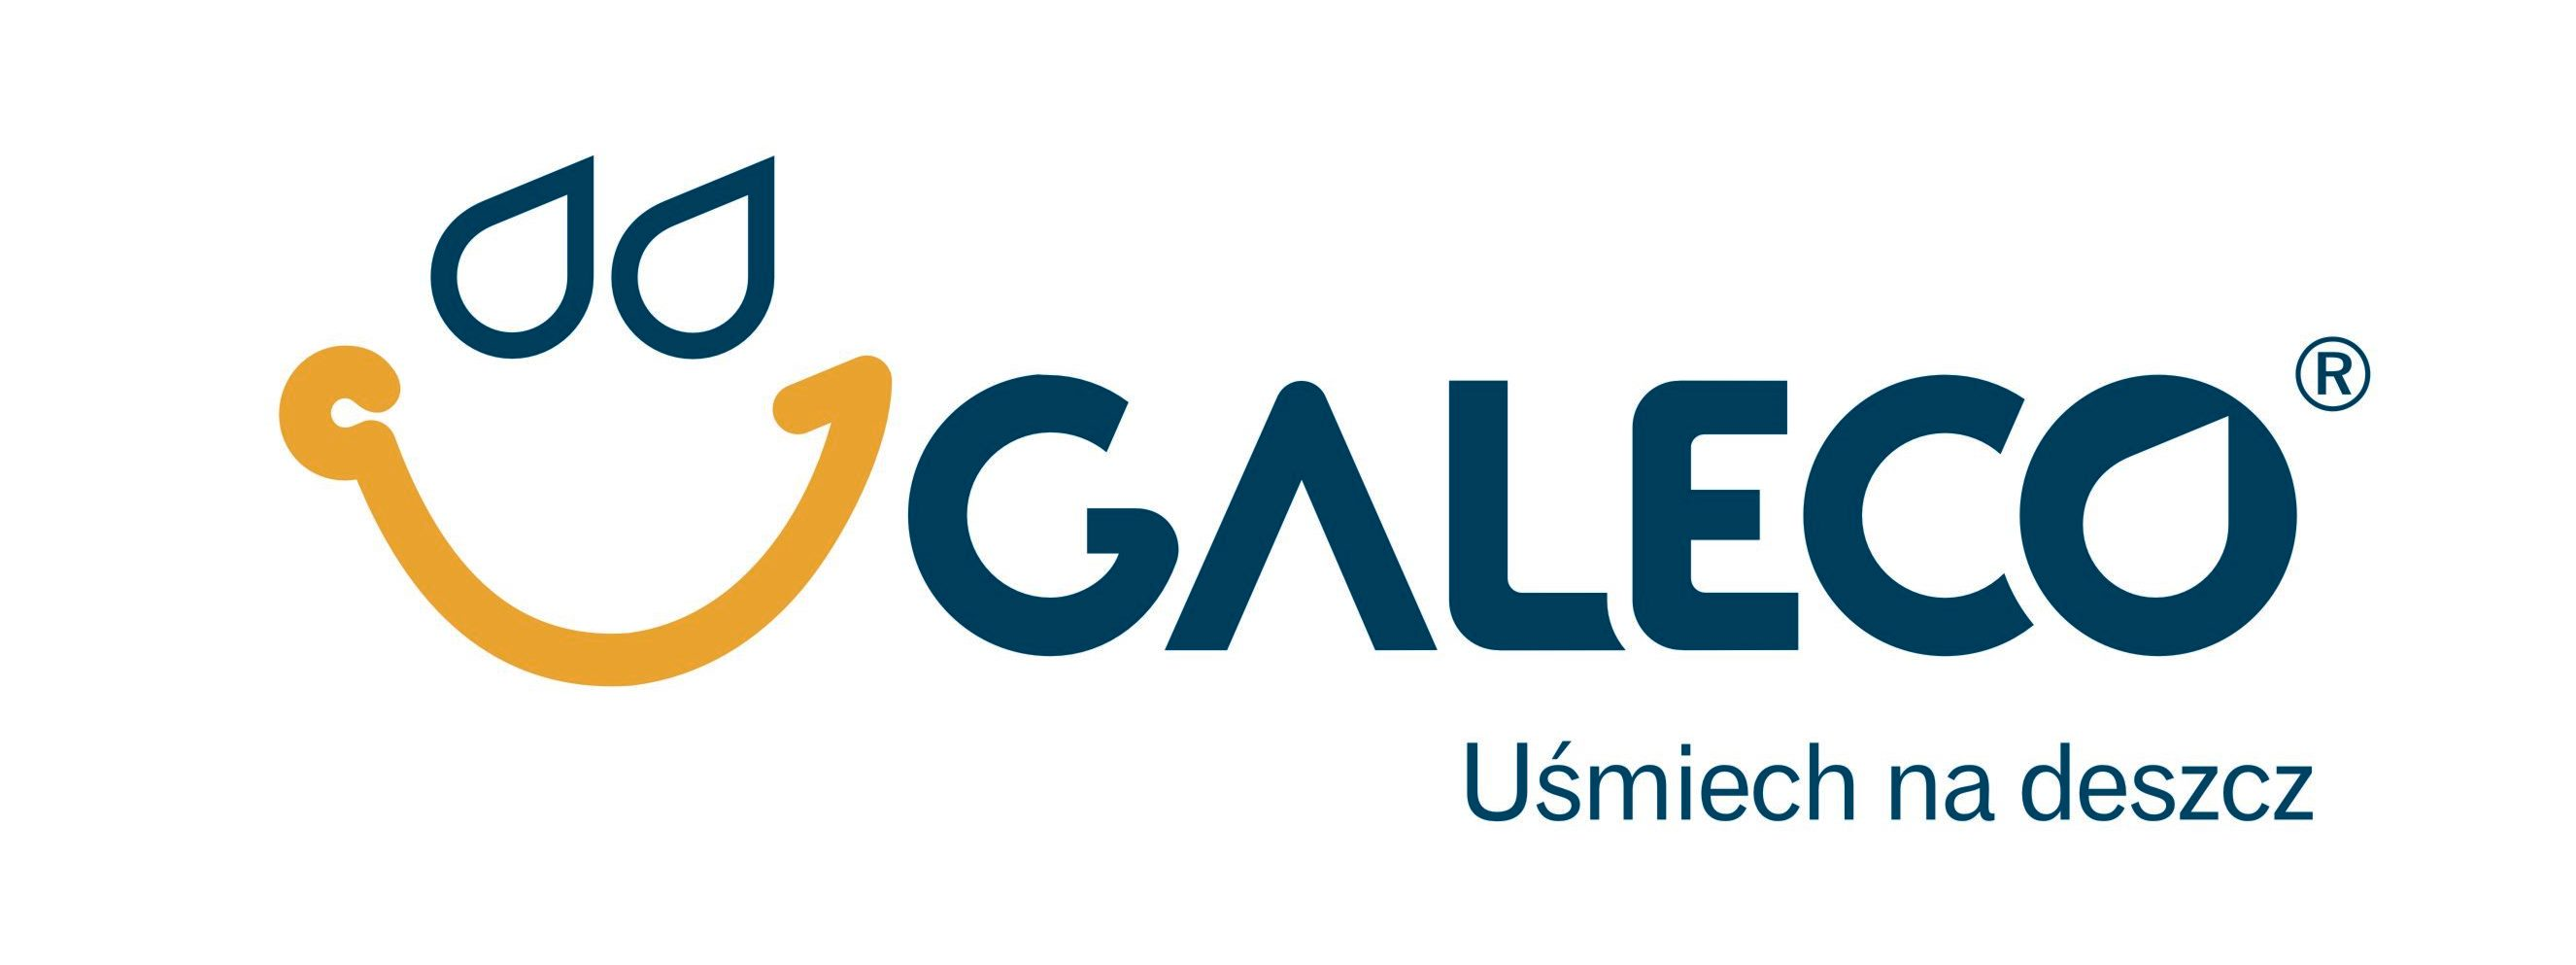 galeco logotyp cmyk